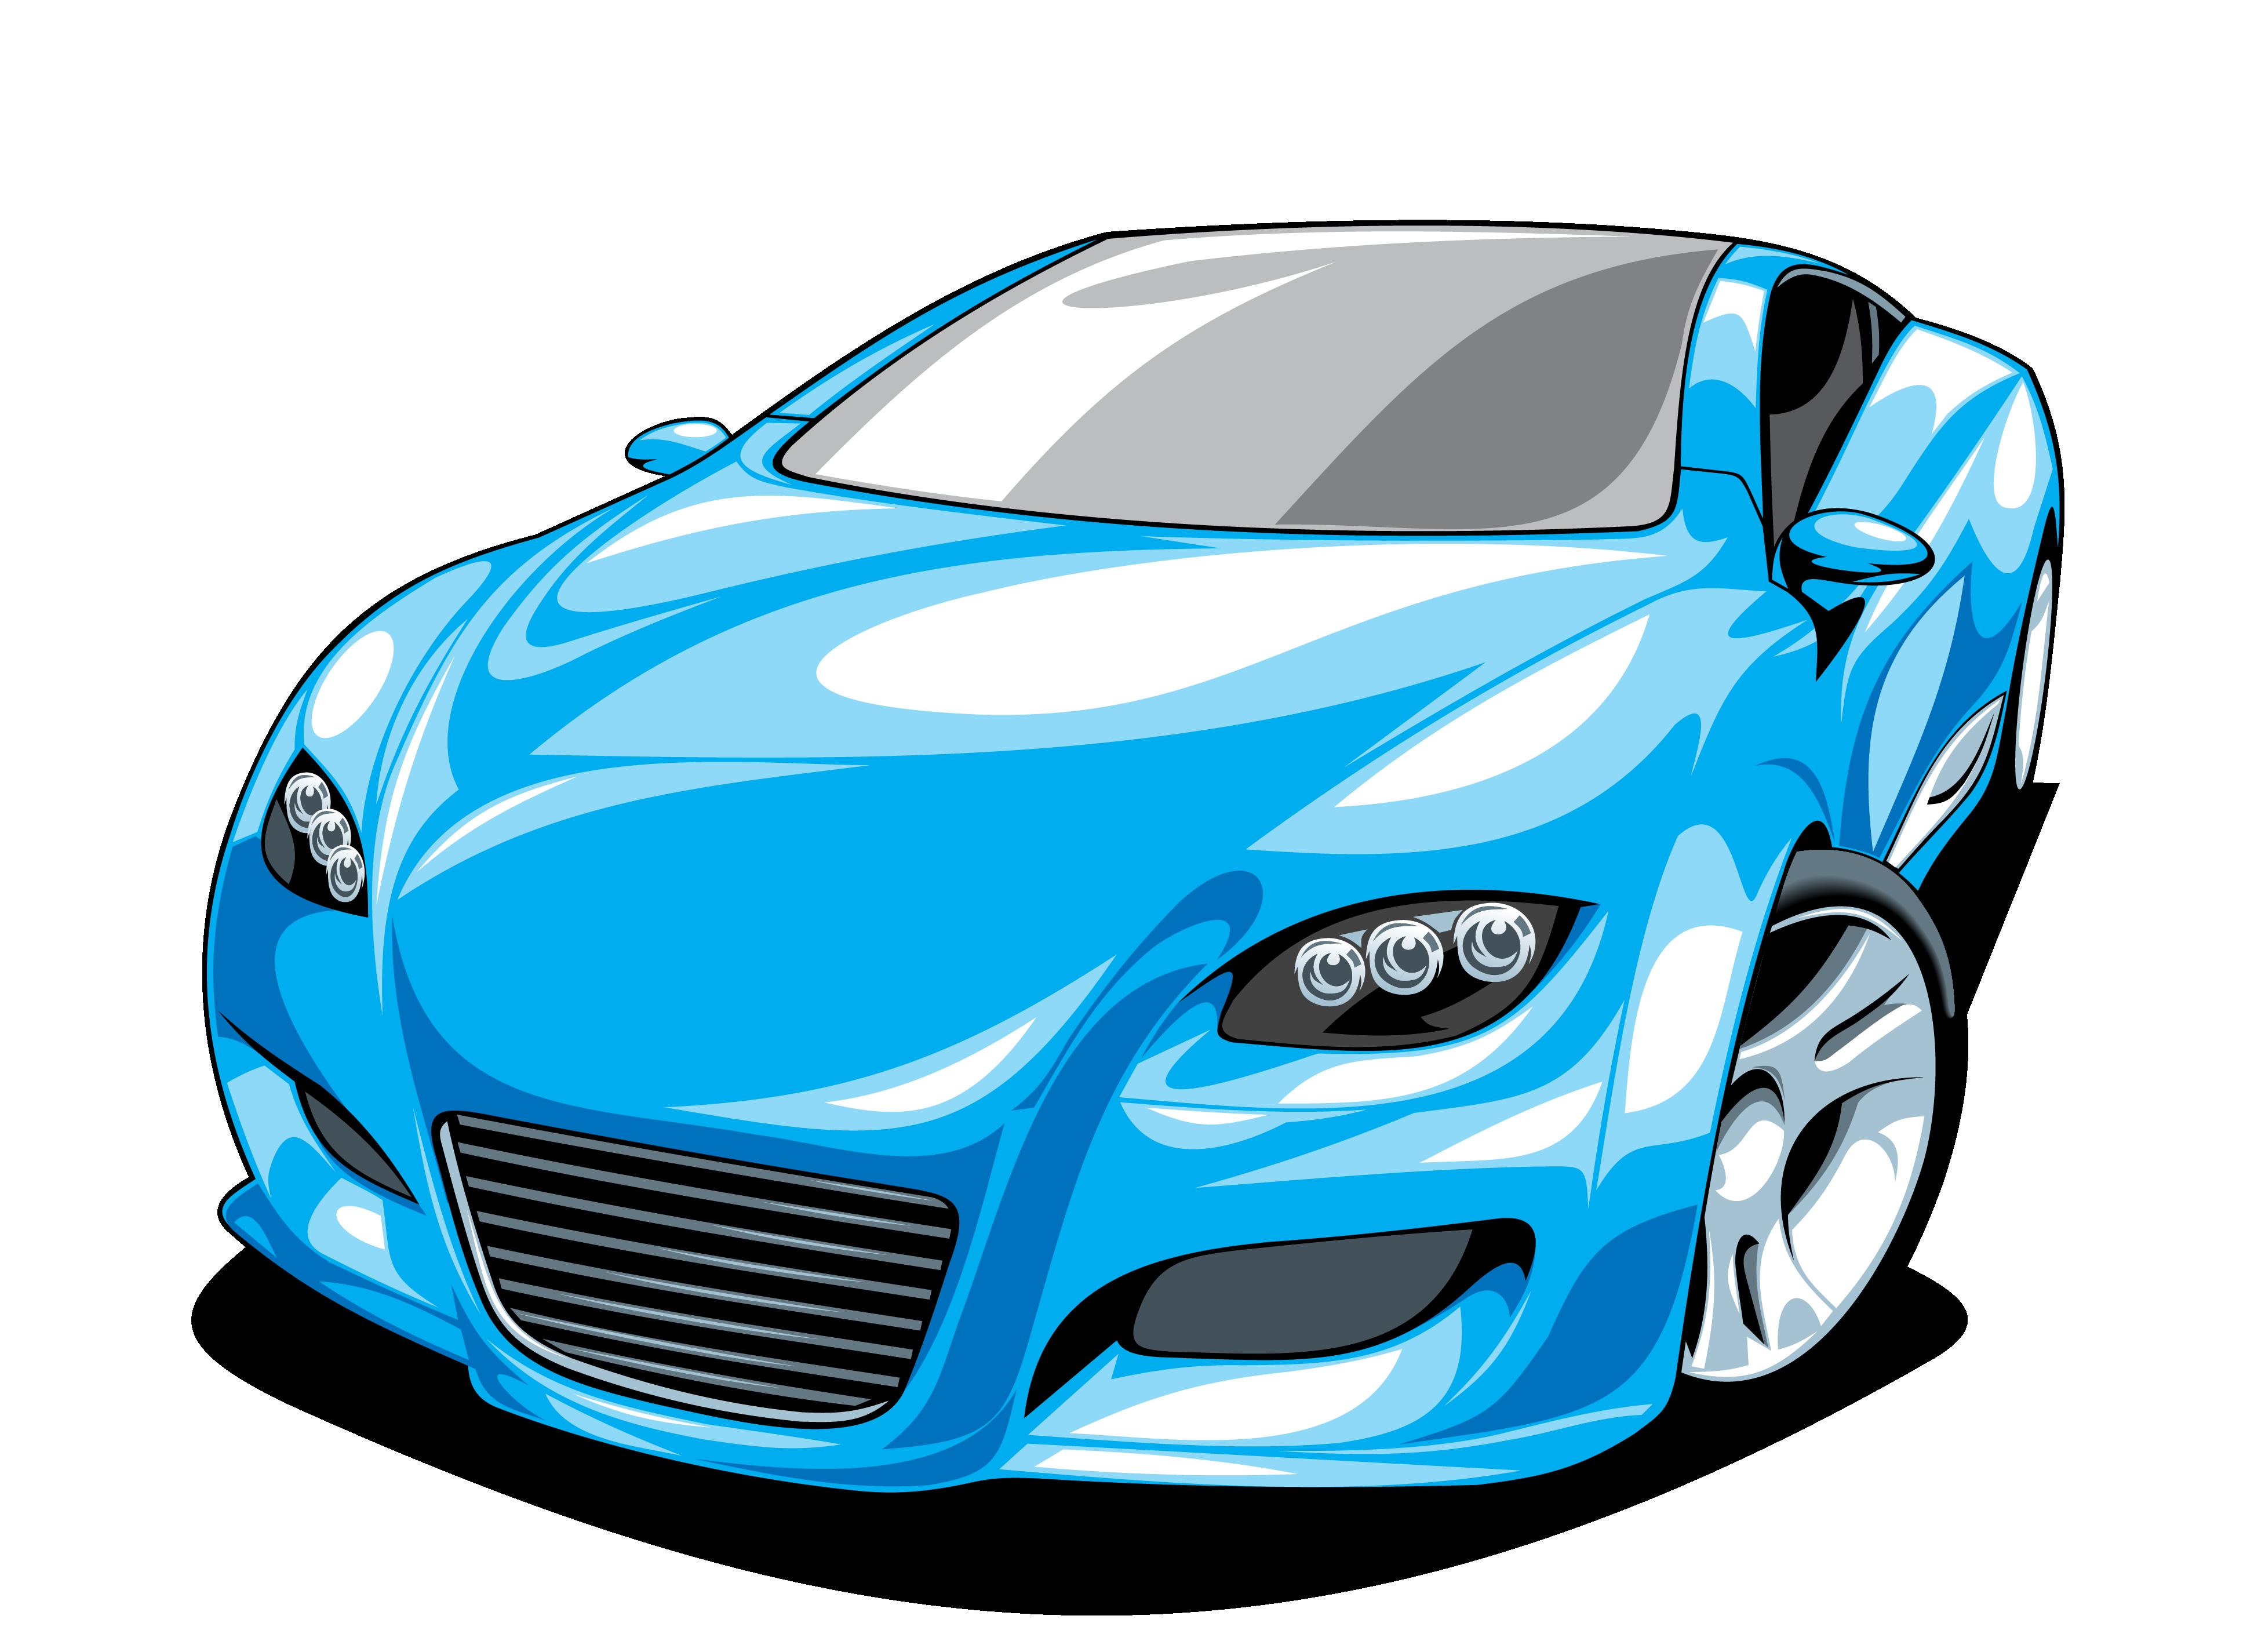 3908x2850 Cartoon Sports Car Images